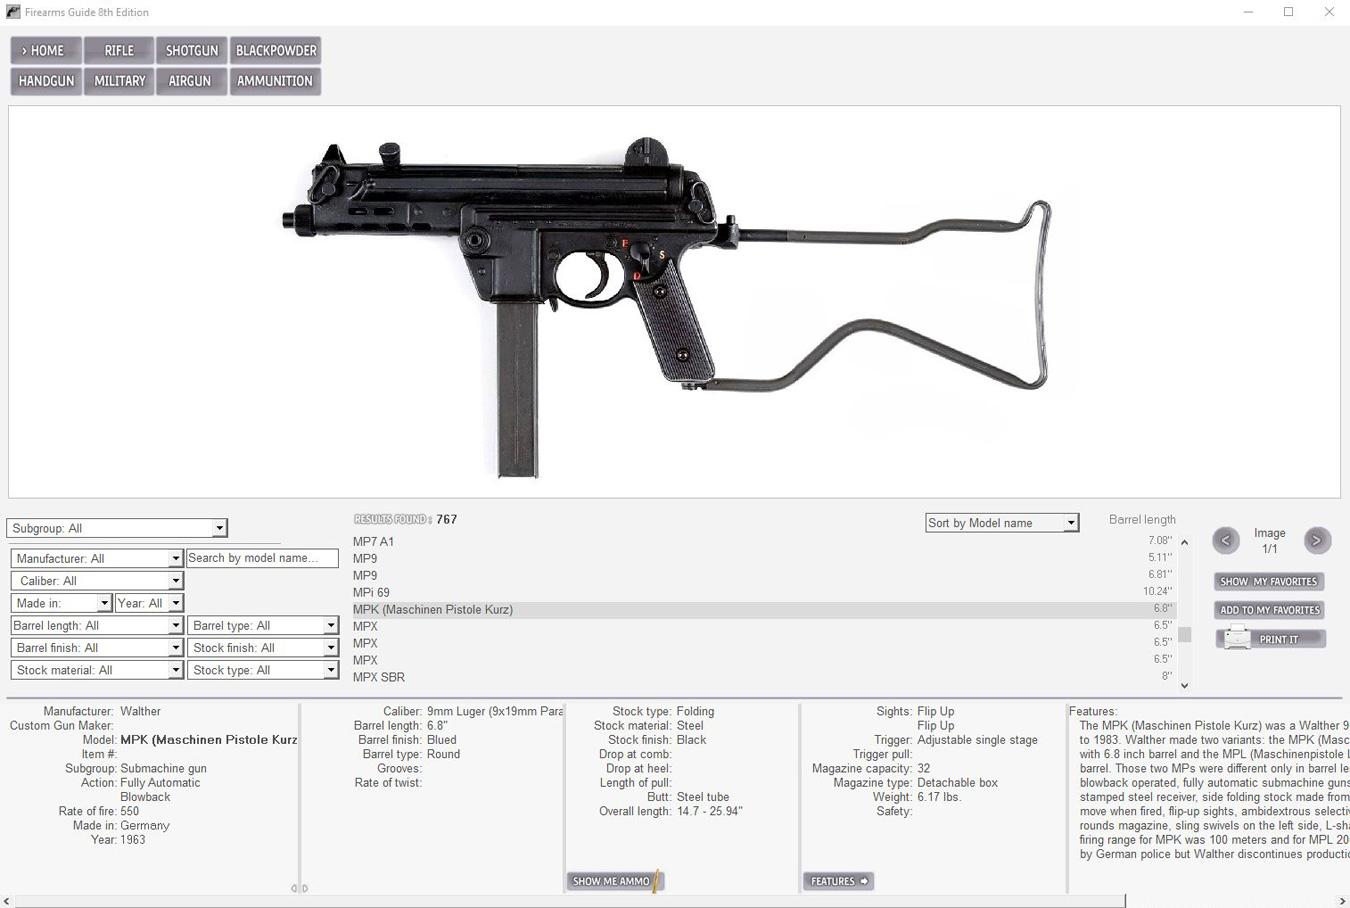 Firearms Guide submachine gun schematic